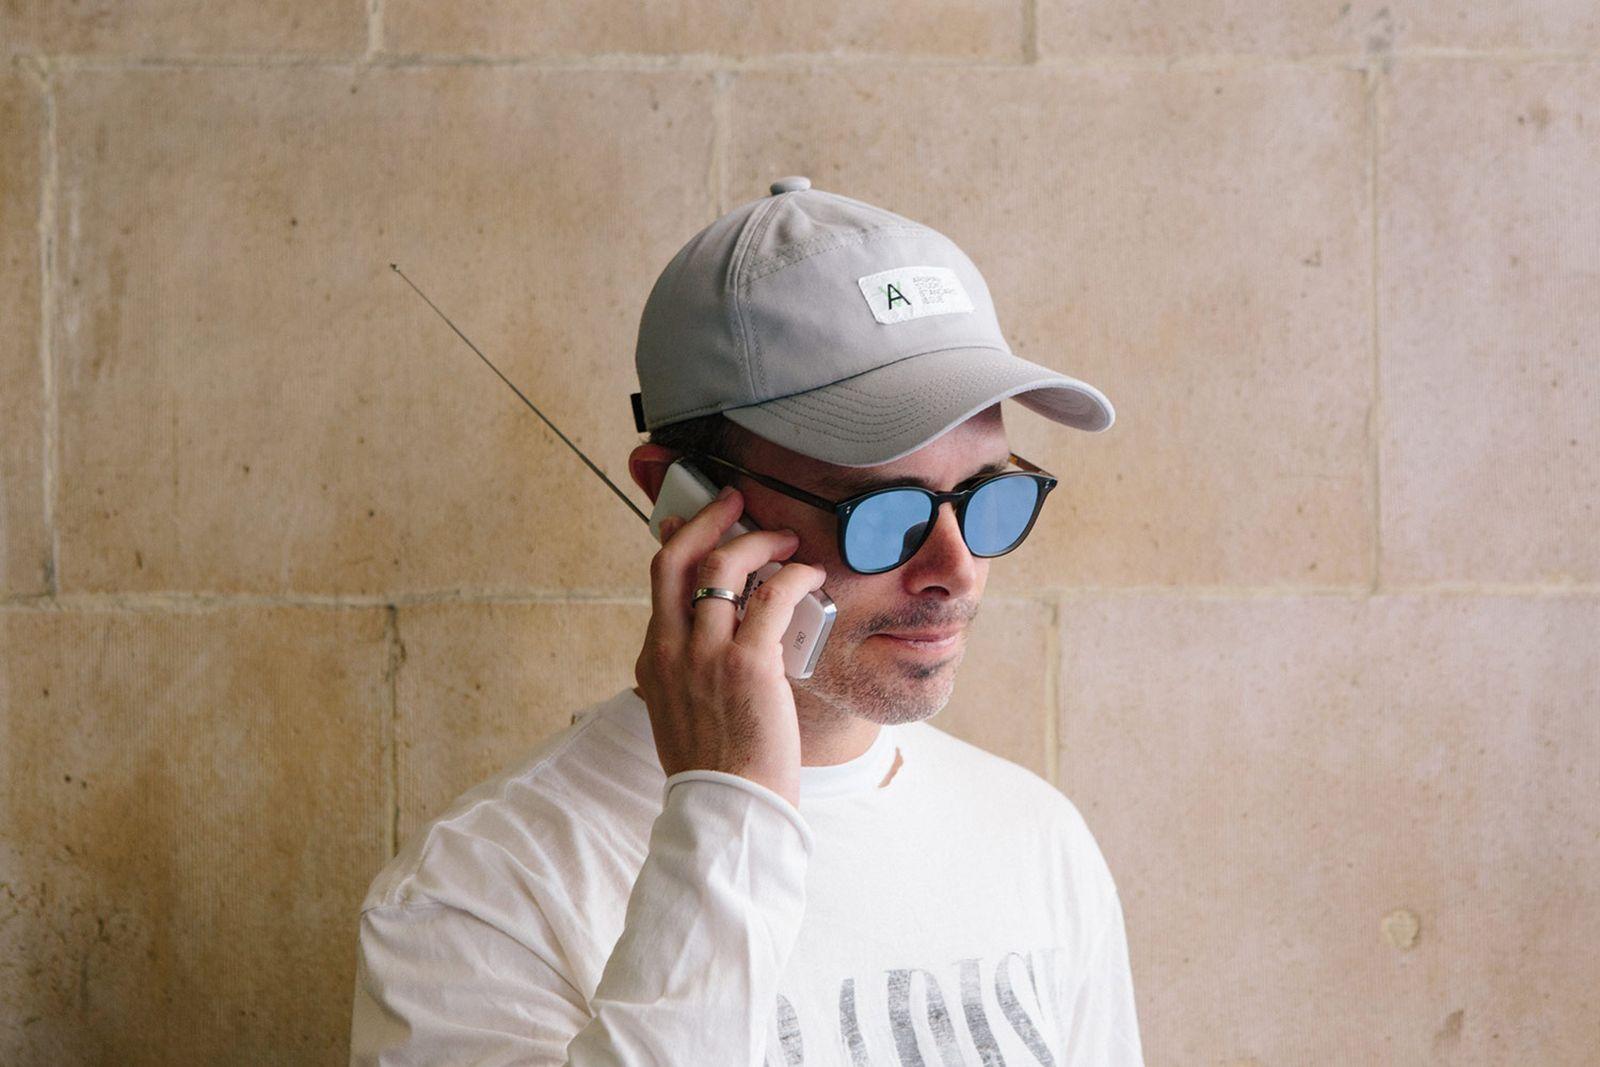 Adidas-Originals-Daniel-Arsham-Highsnobiety-12